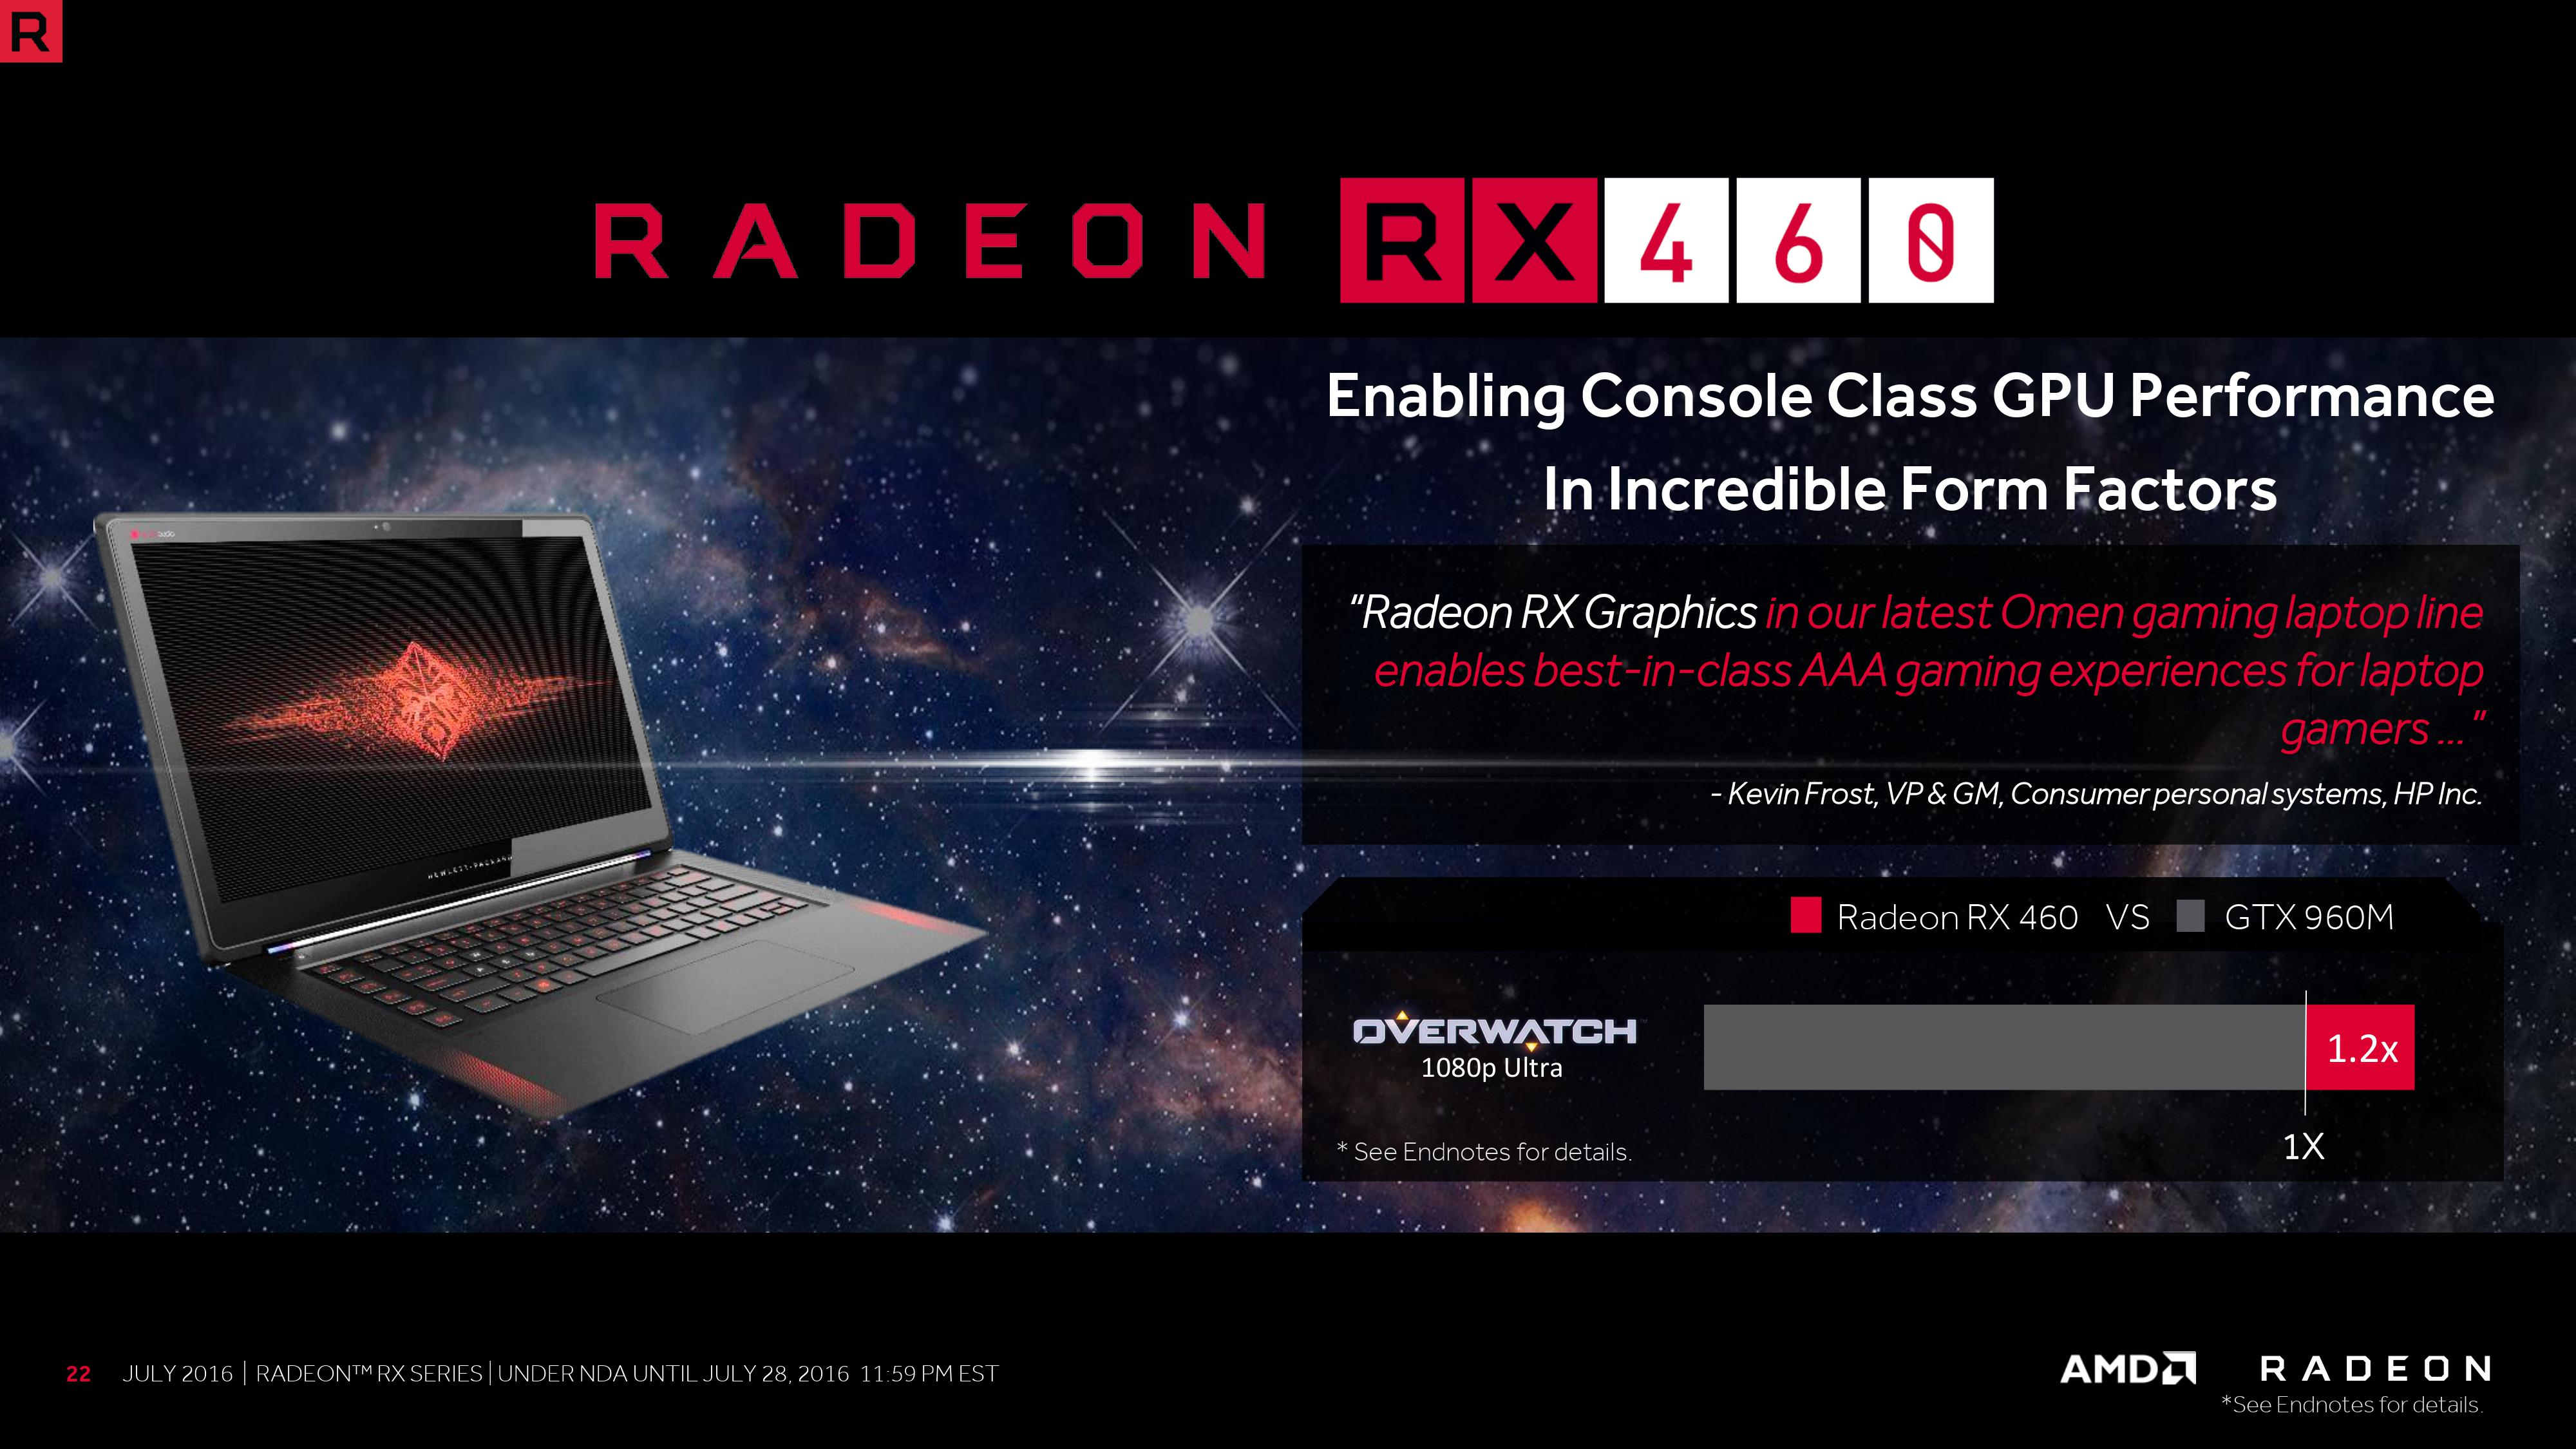 AMD RADEON RX460 WINDOWS 8 DRIVER